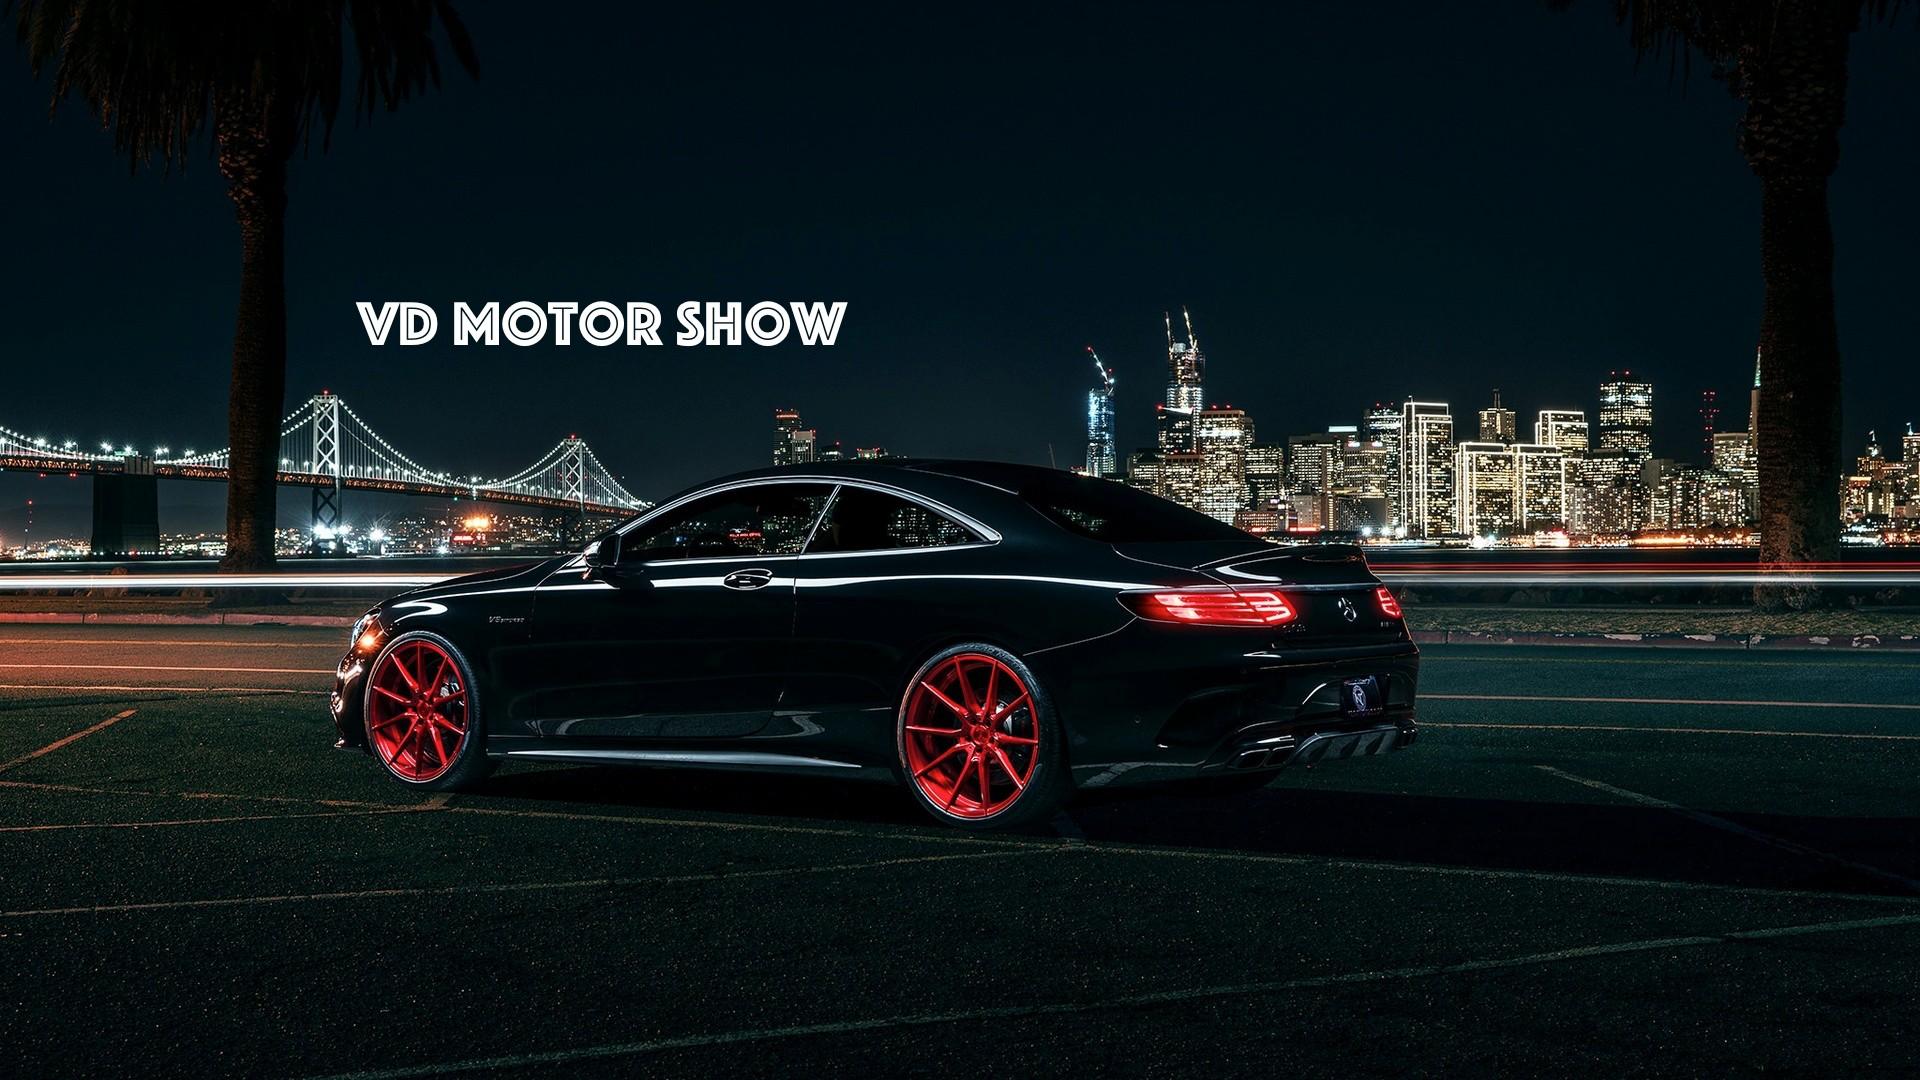 VD Motor Show wallpaper